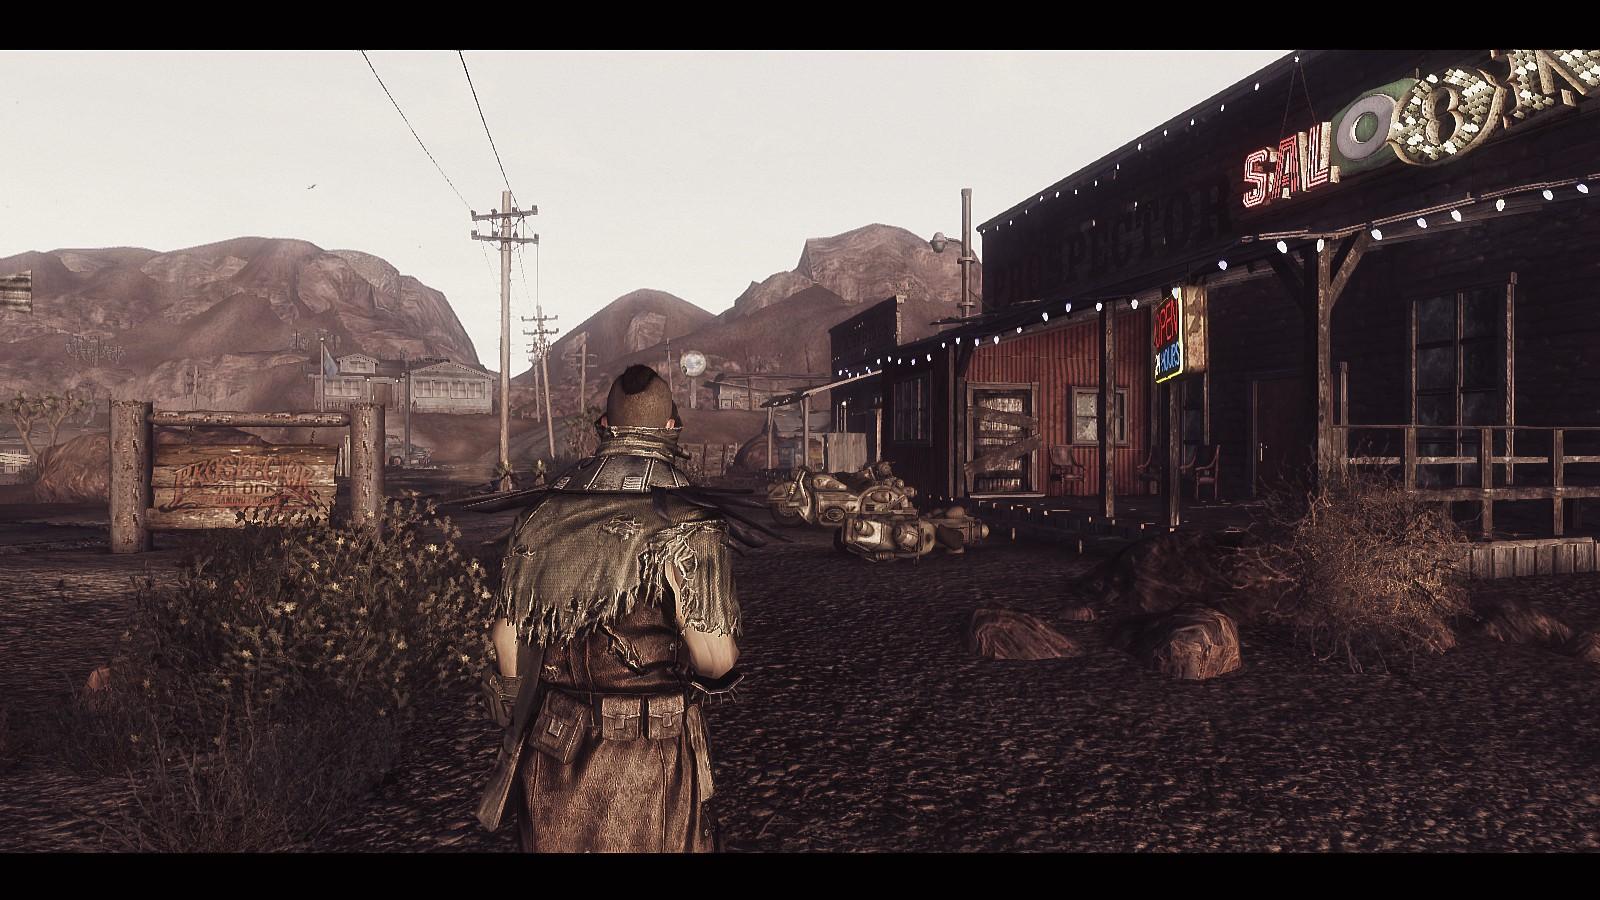 Fallout New Vegas Armored Vault 13 Jumpsuit Mod – DACC